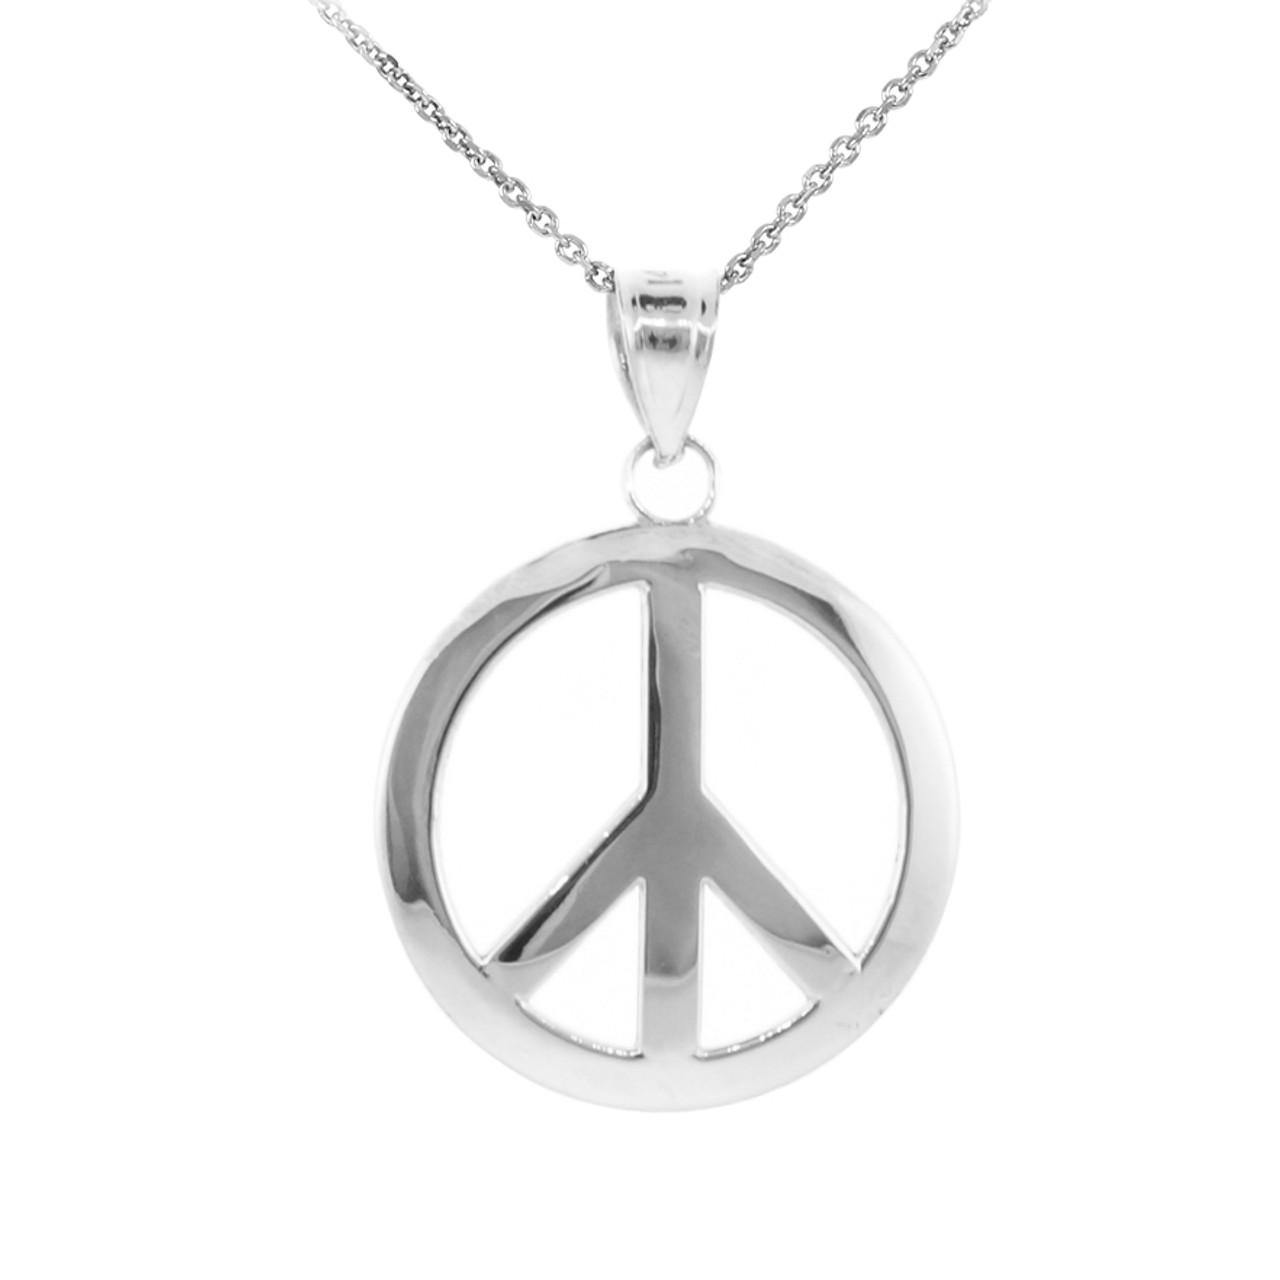 925 sterling silver peace symbol pendant necklace l factory 925 sterling silver peace symbol pendant necklace l aloadofball Images